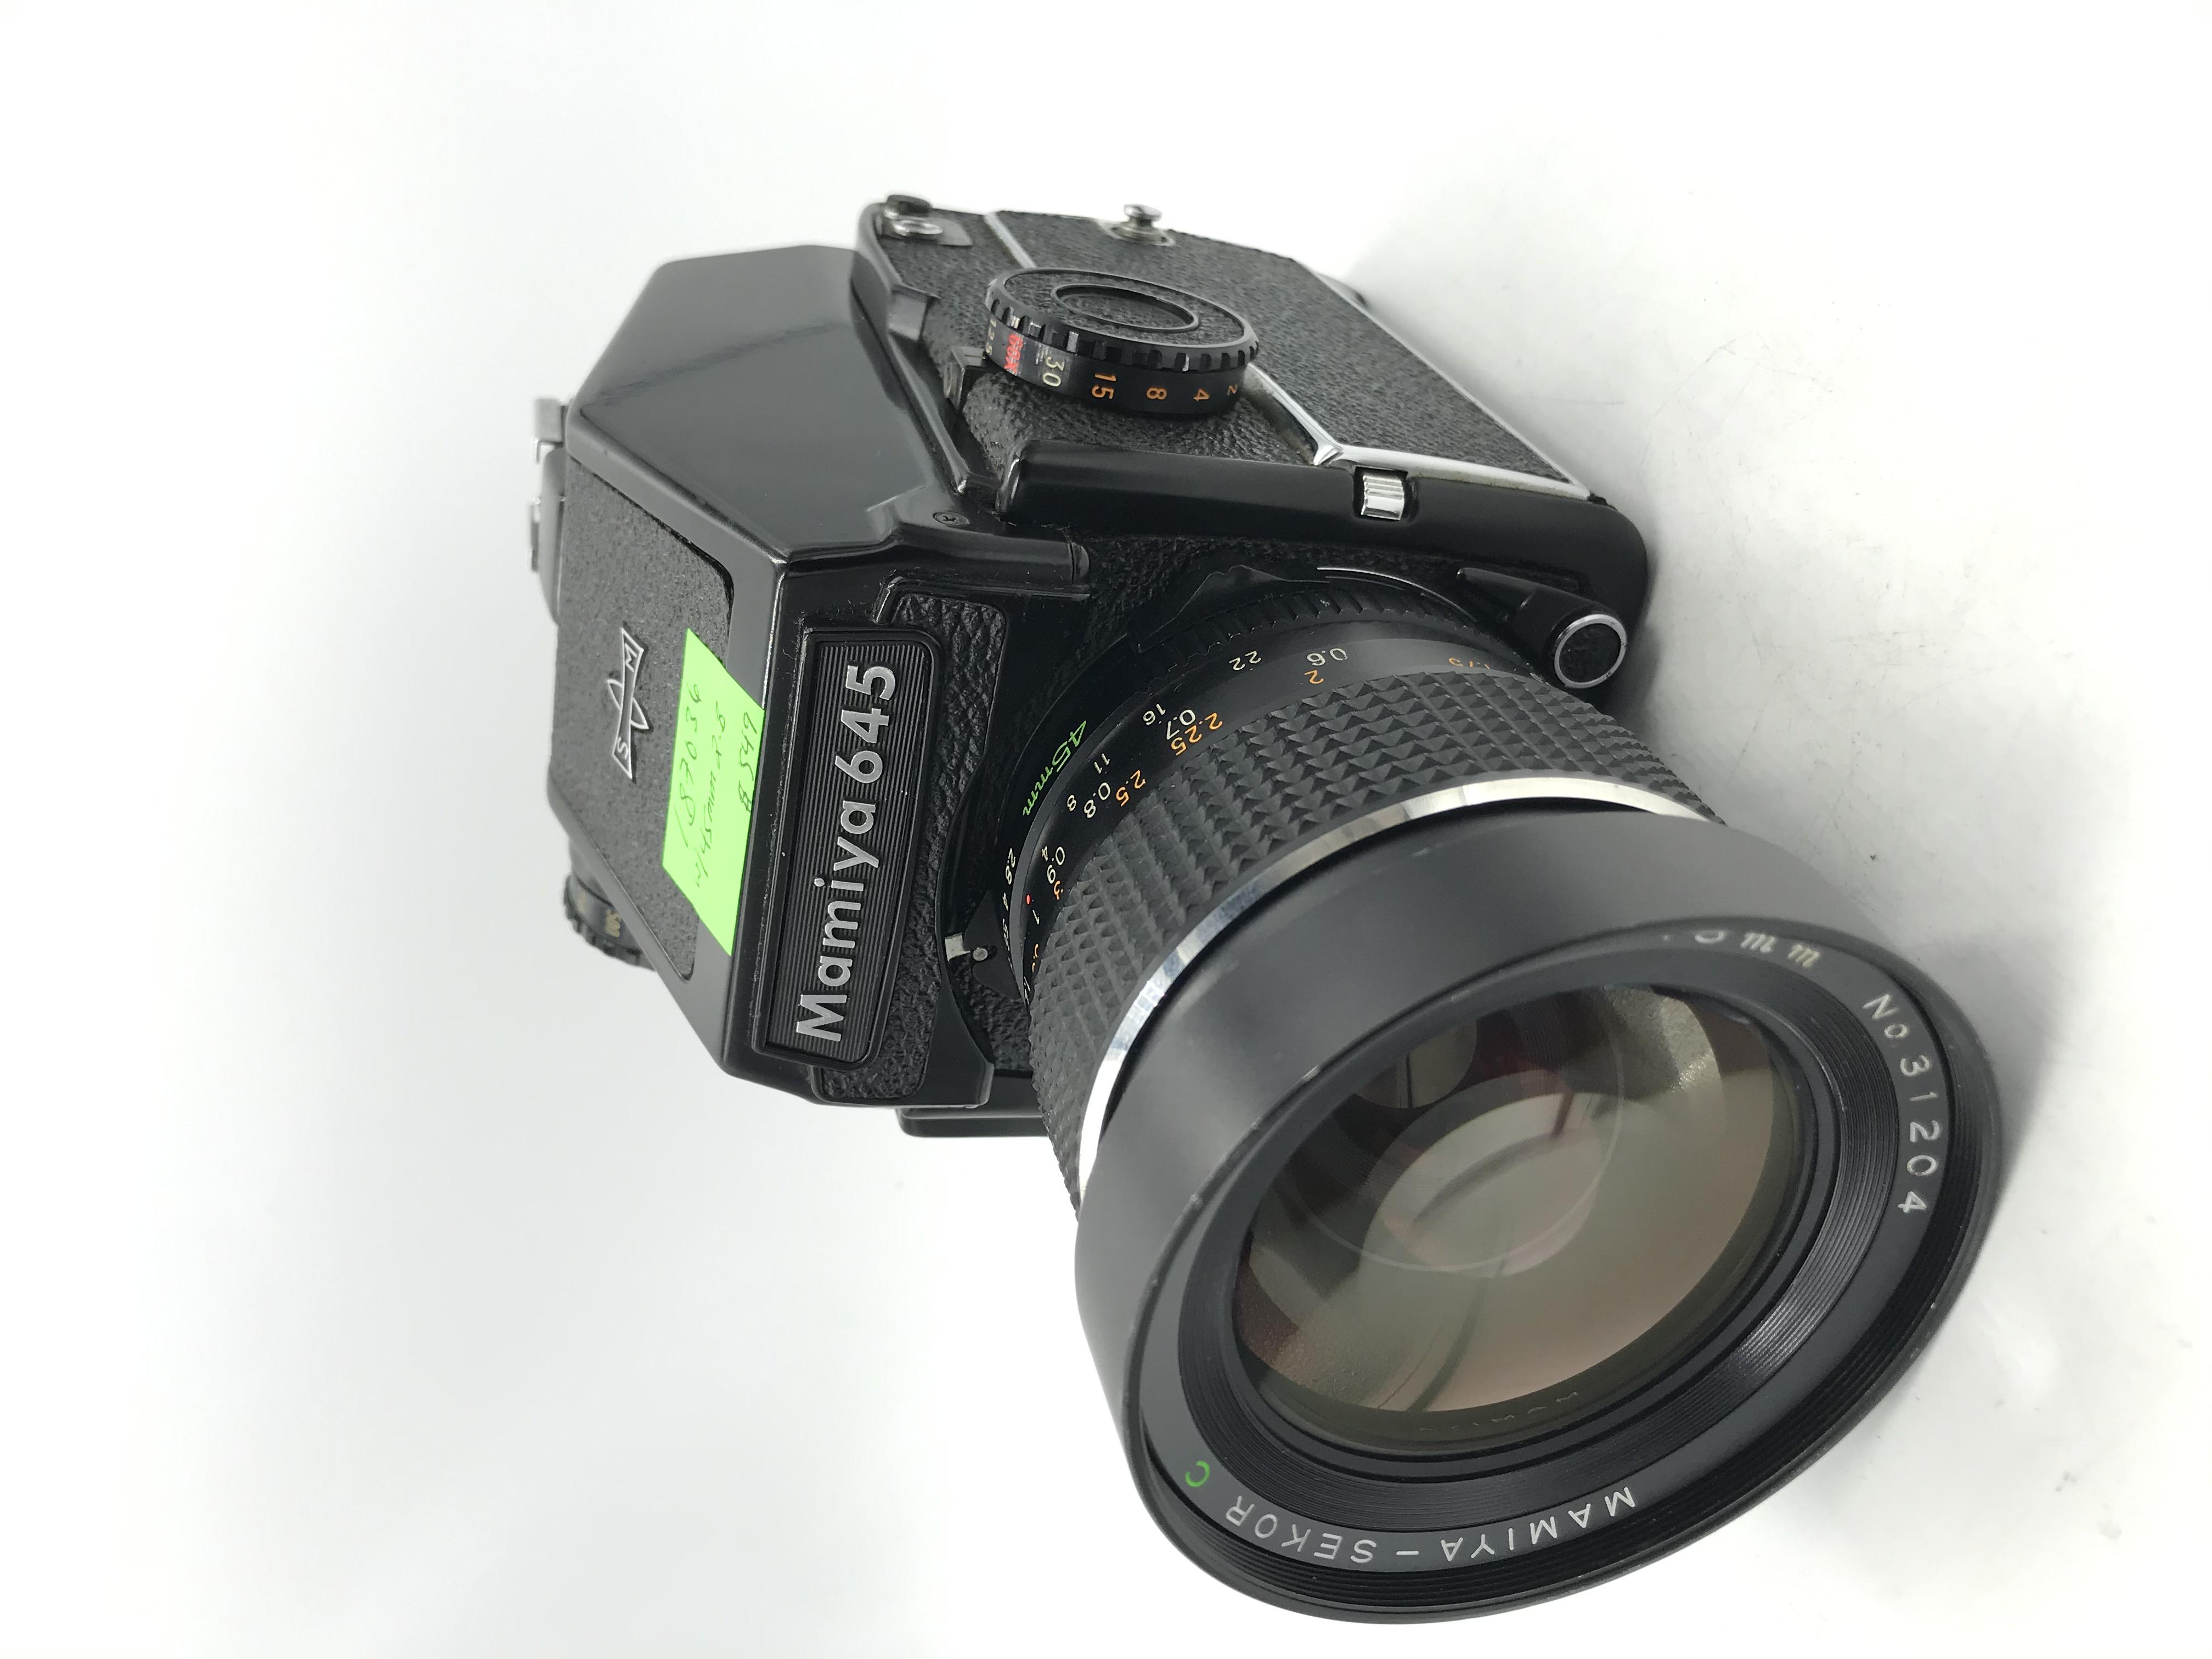 USED Mamiya 645 1000S Film Camera W/ 45mm F2.8 Lens